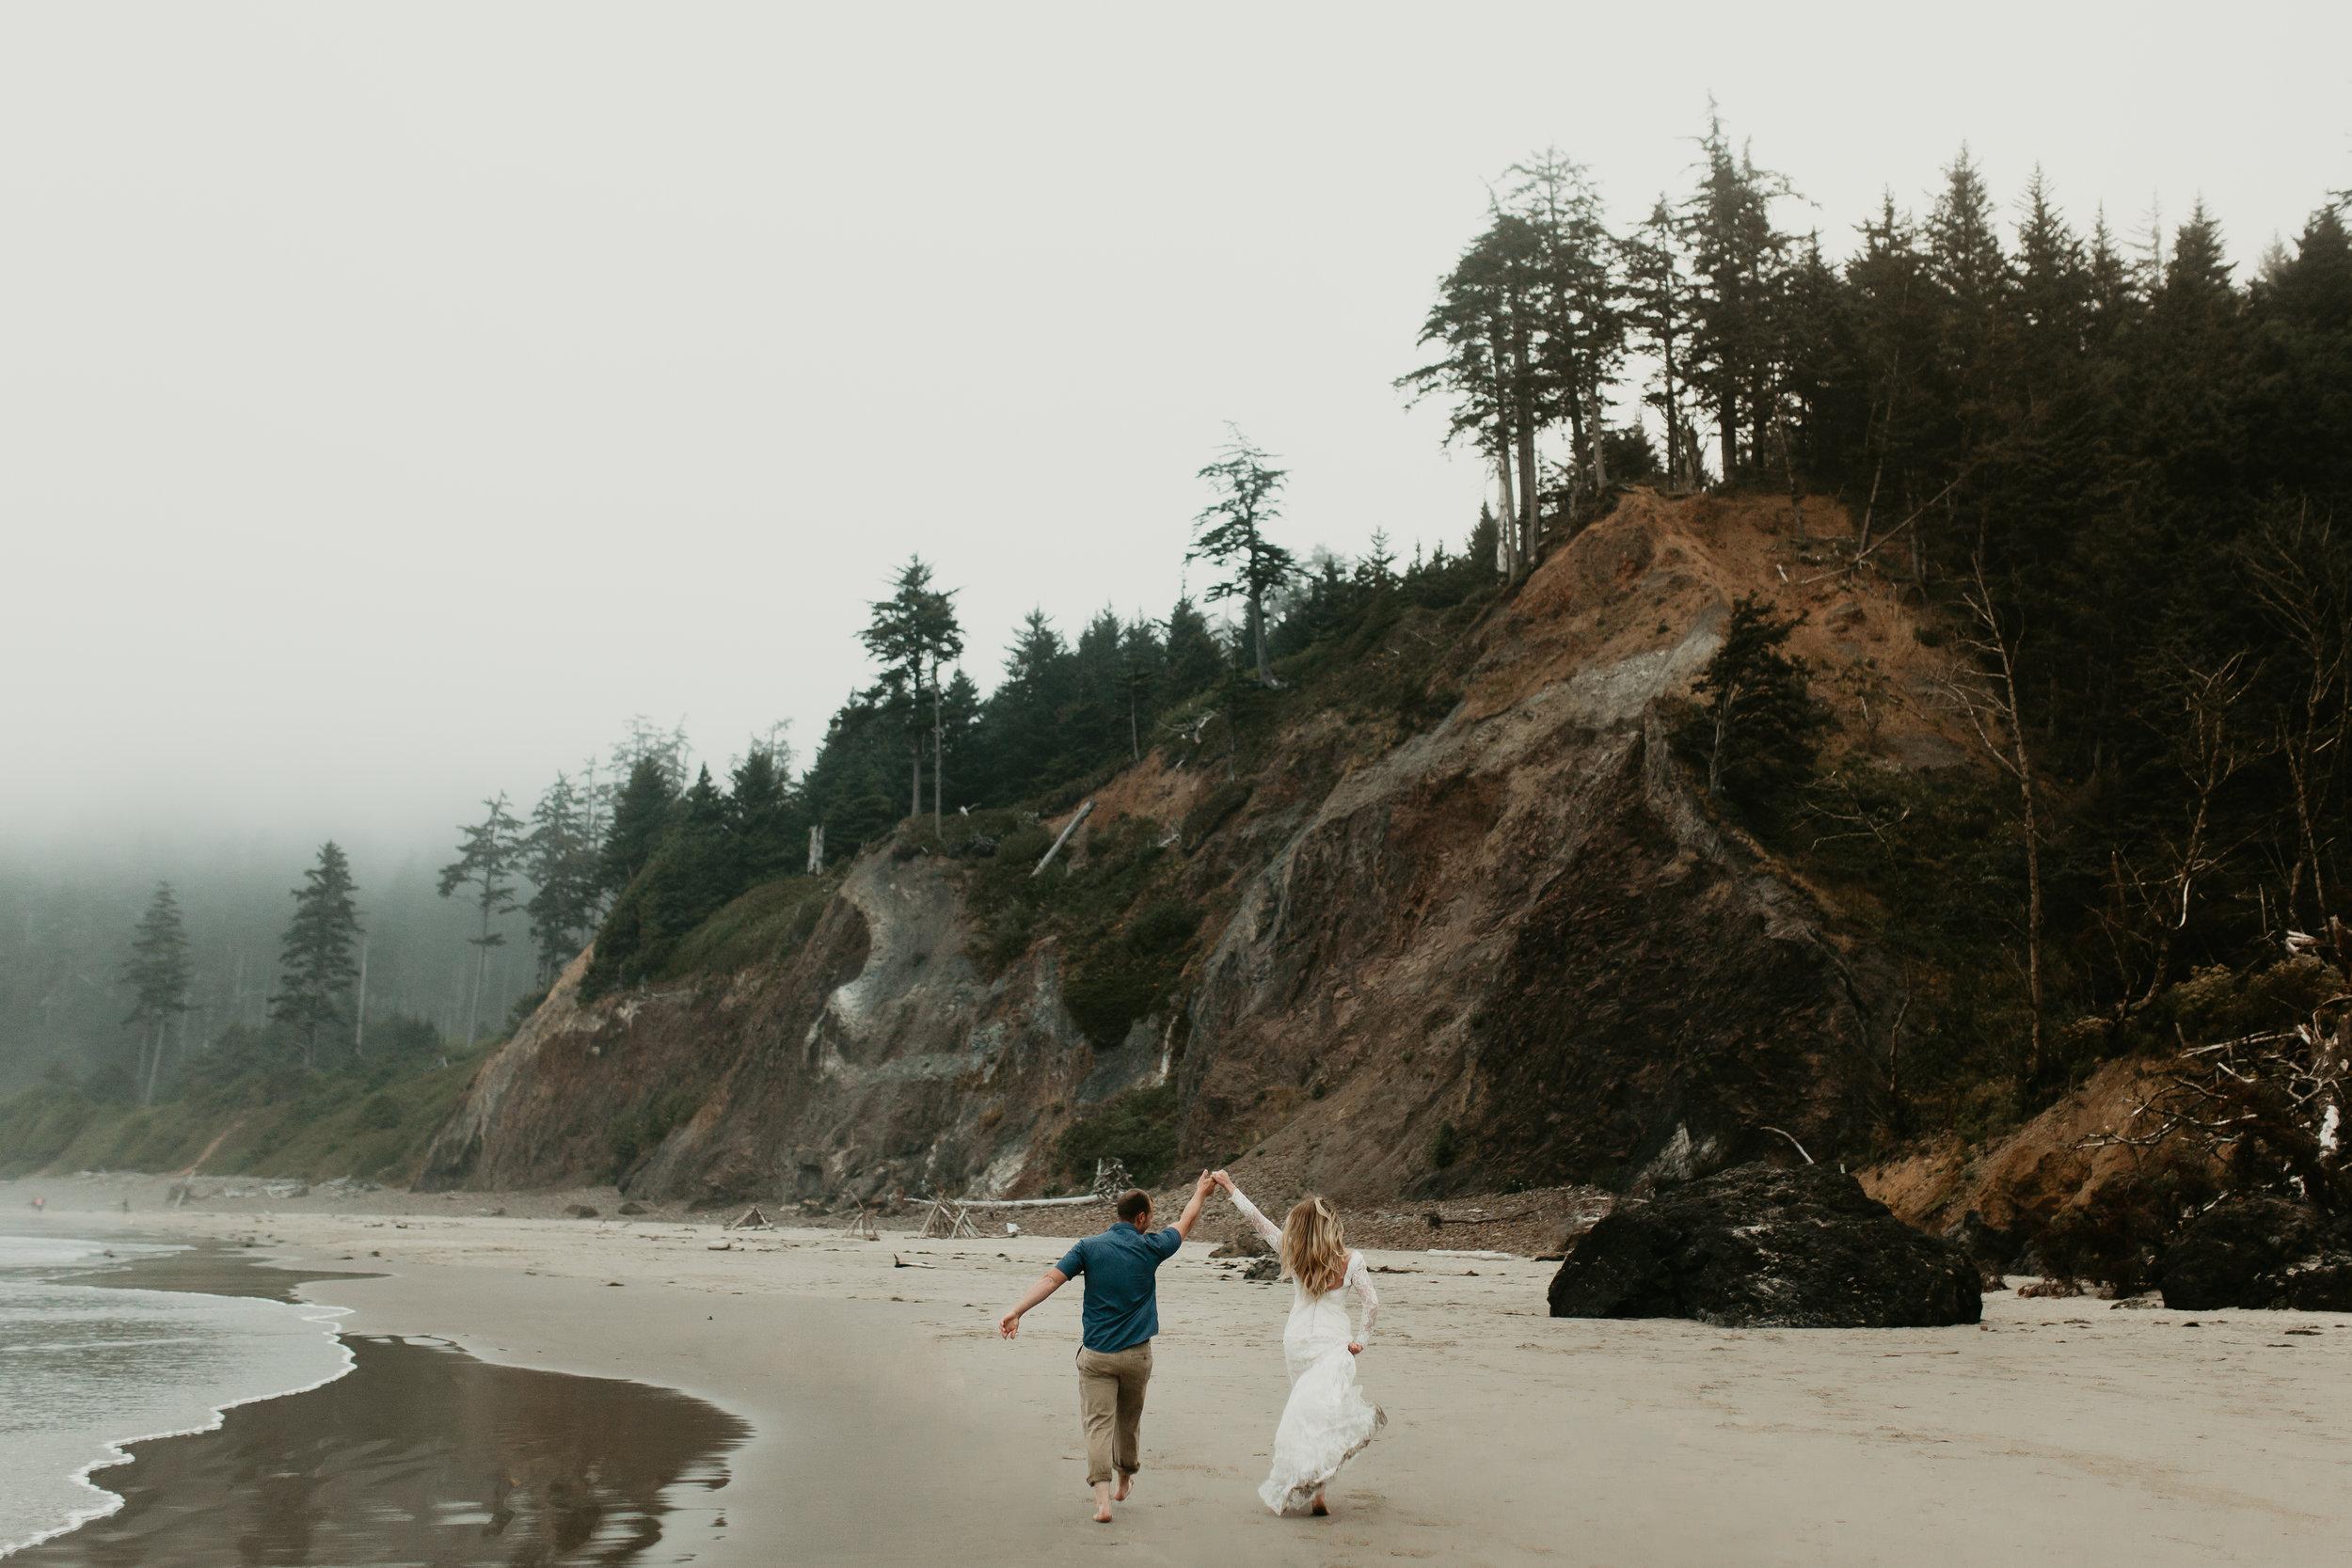 nicole-daacke-photography-ecola-state-park-oregon-elopement-bridal-photos-photographer-for-cannon-beach-elopement-oregon-coast-elopement-photographer-foggy-summer-elopement-cannon-beach-best-adventure-elopement-photographer-7078.jpg